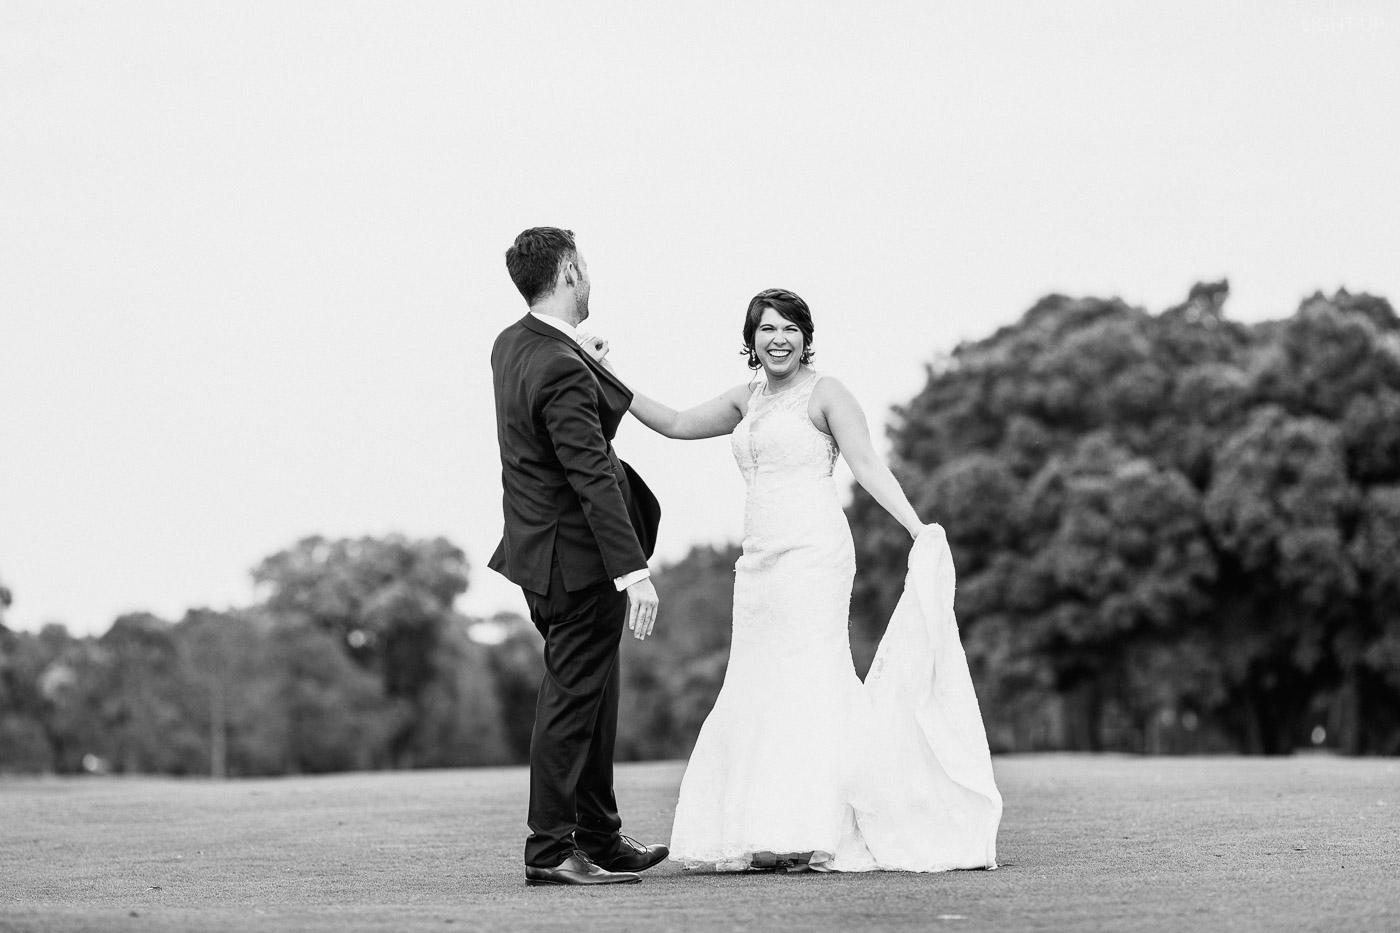 hstoric-dubsdread-wedding-orlando-31.jpg